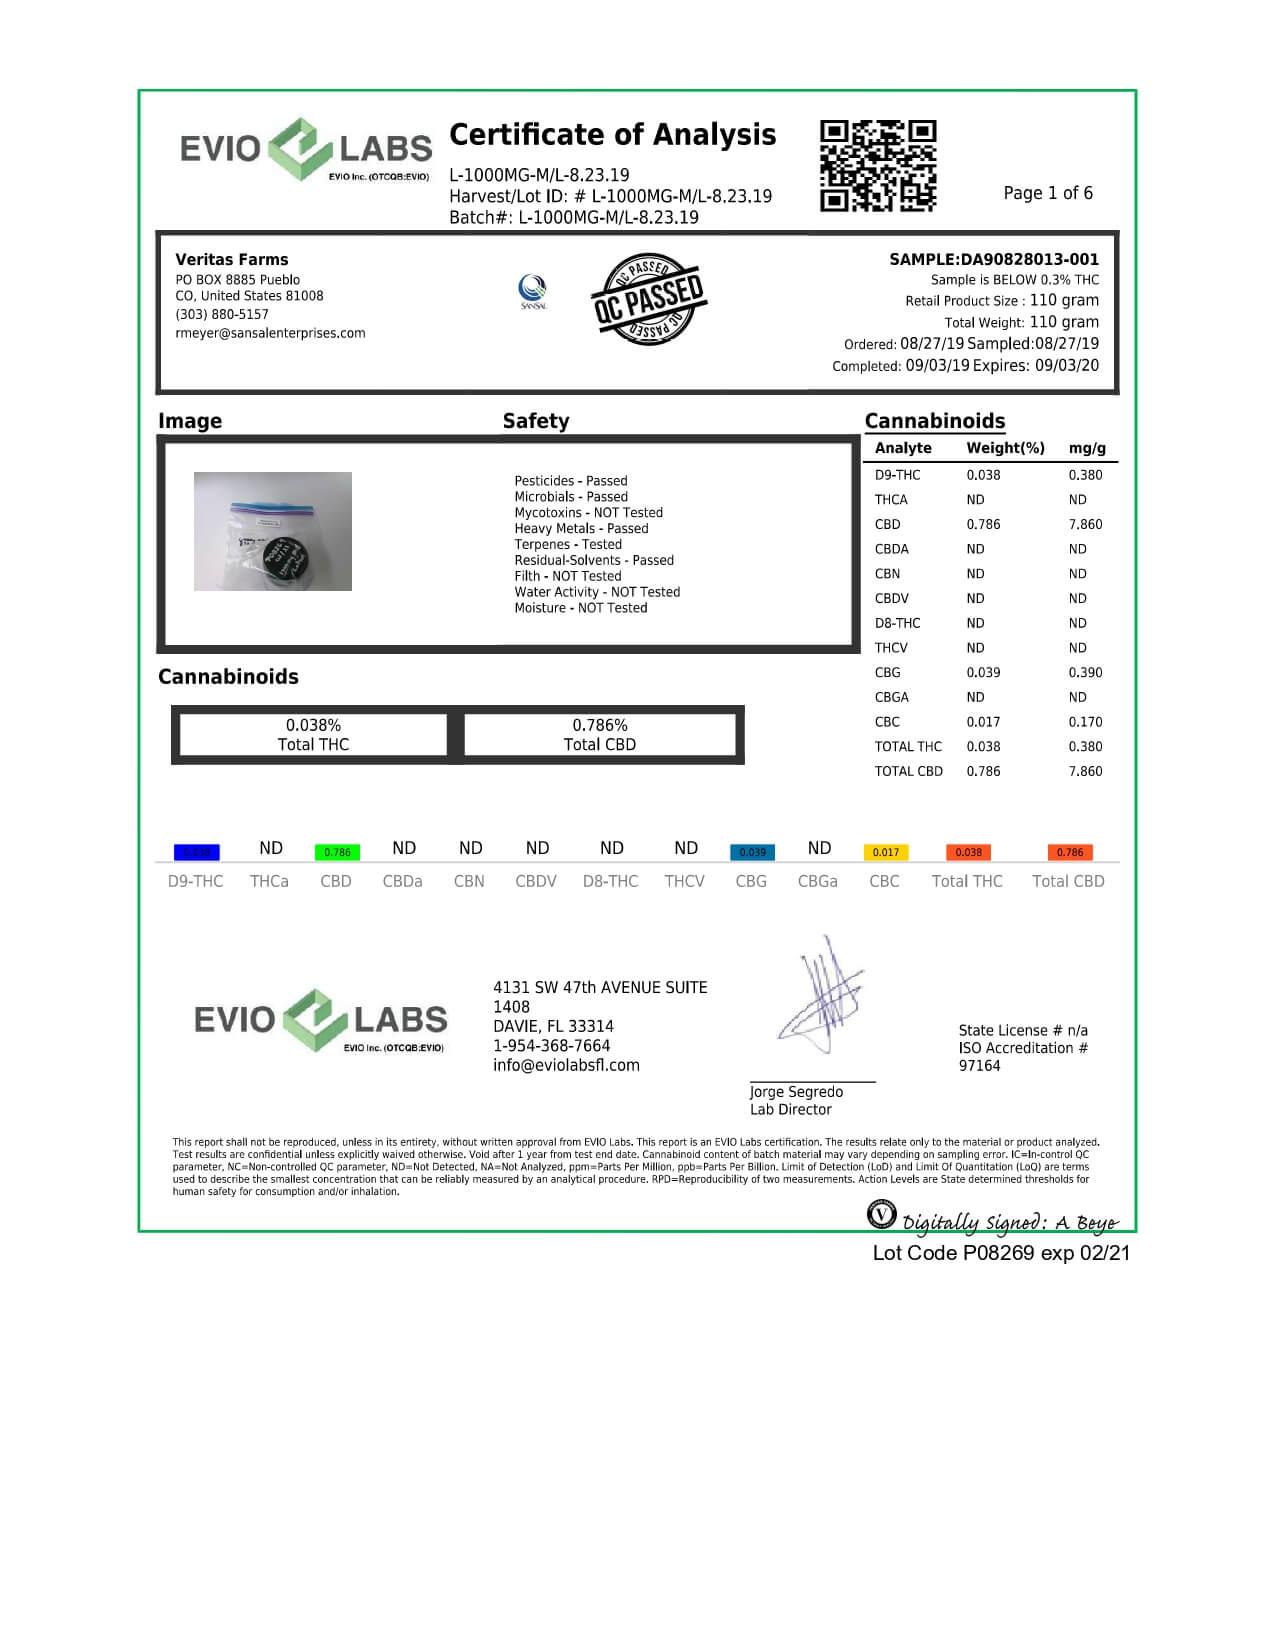 Veritas Farms CBD Topical Full Spectrum Minted Lavender Lotion 1000mg Lab Report